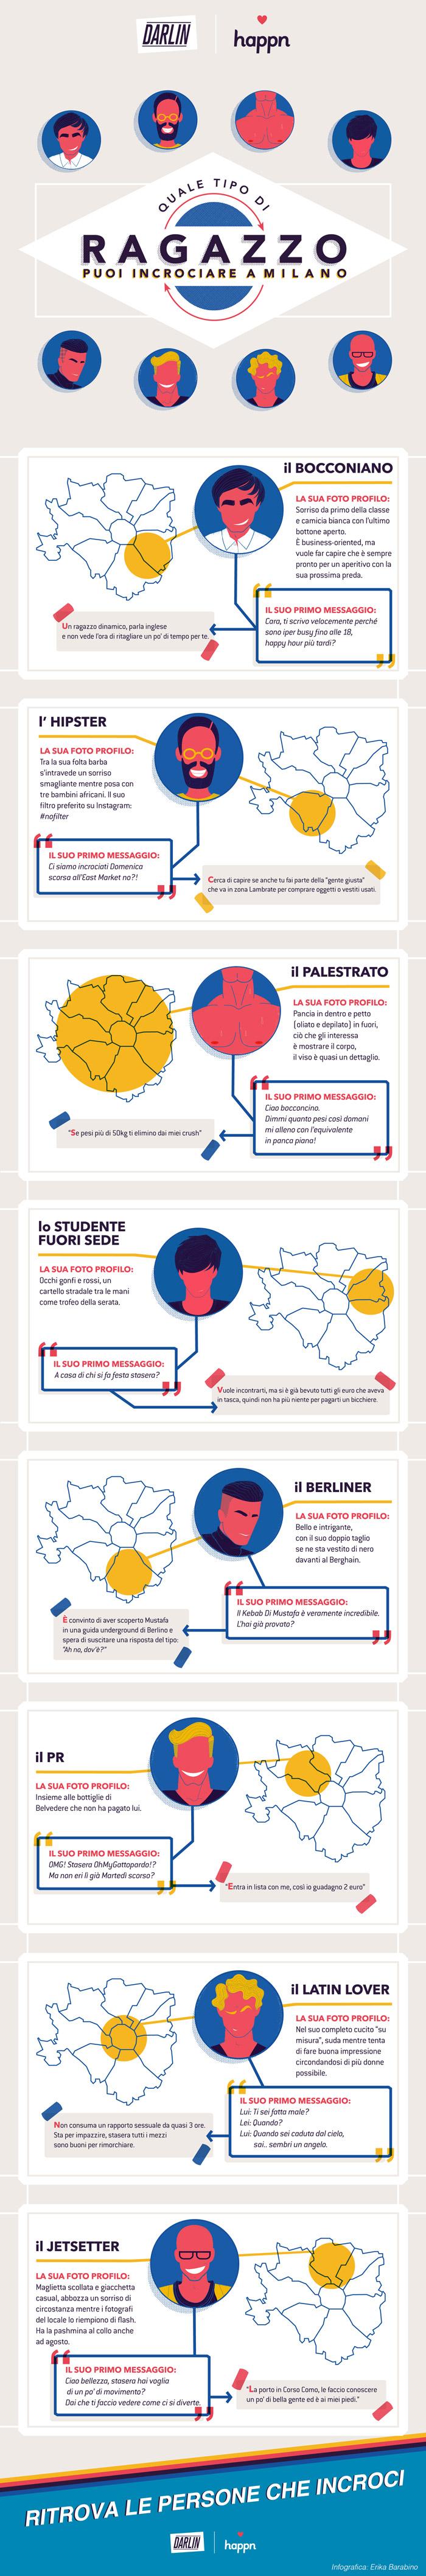 infografica_tipi_ragazzi_milano_happn